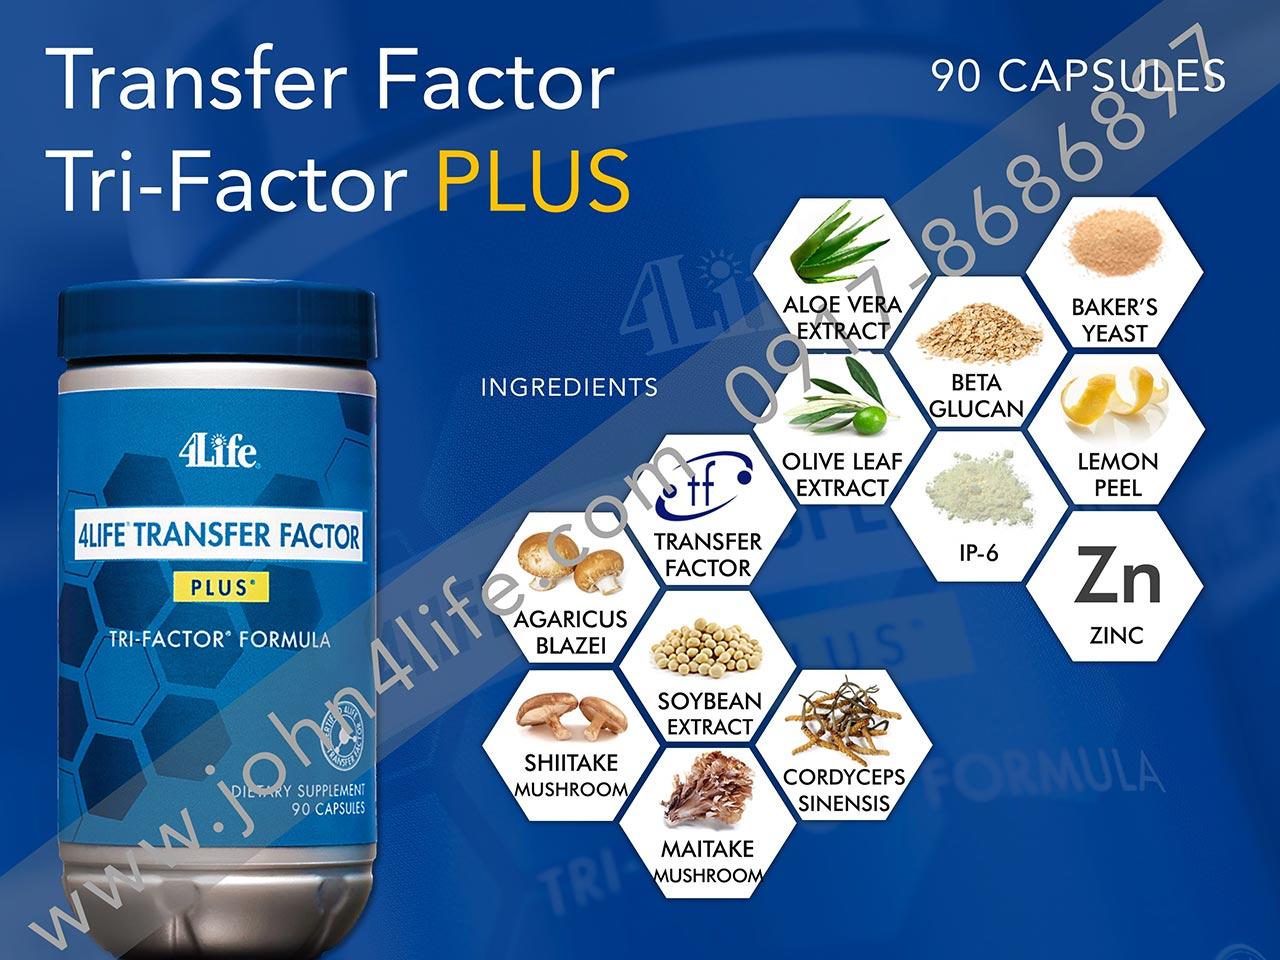 transfer factor plus, tf plus, immune booster, mushroom, cordyceps, zinc, infection